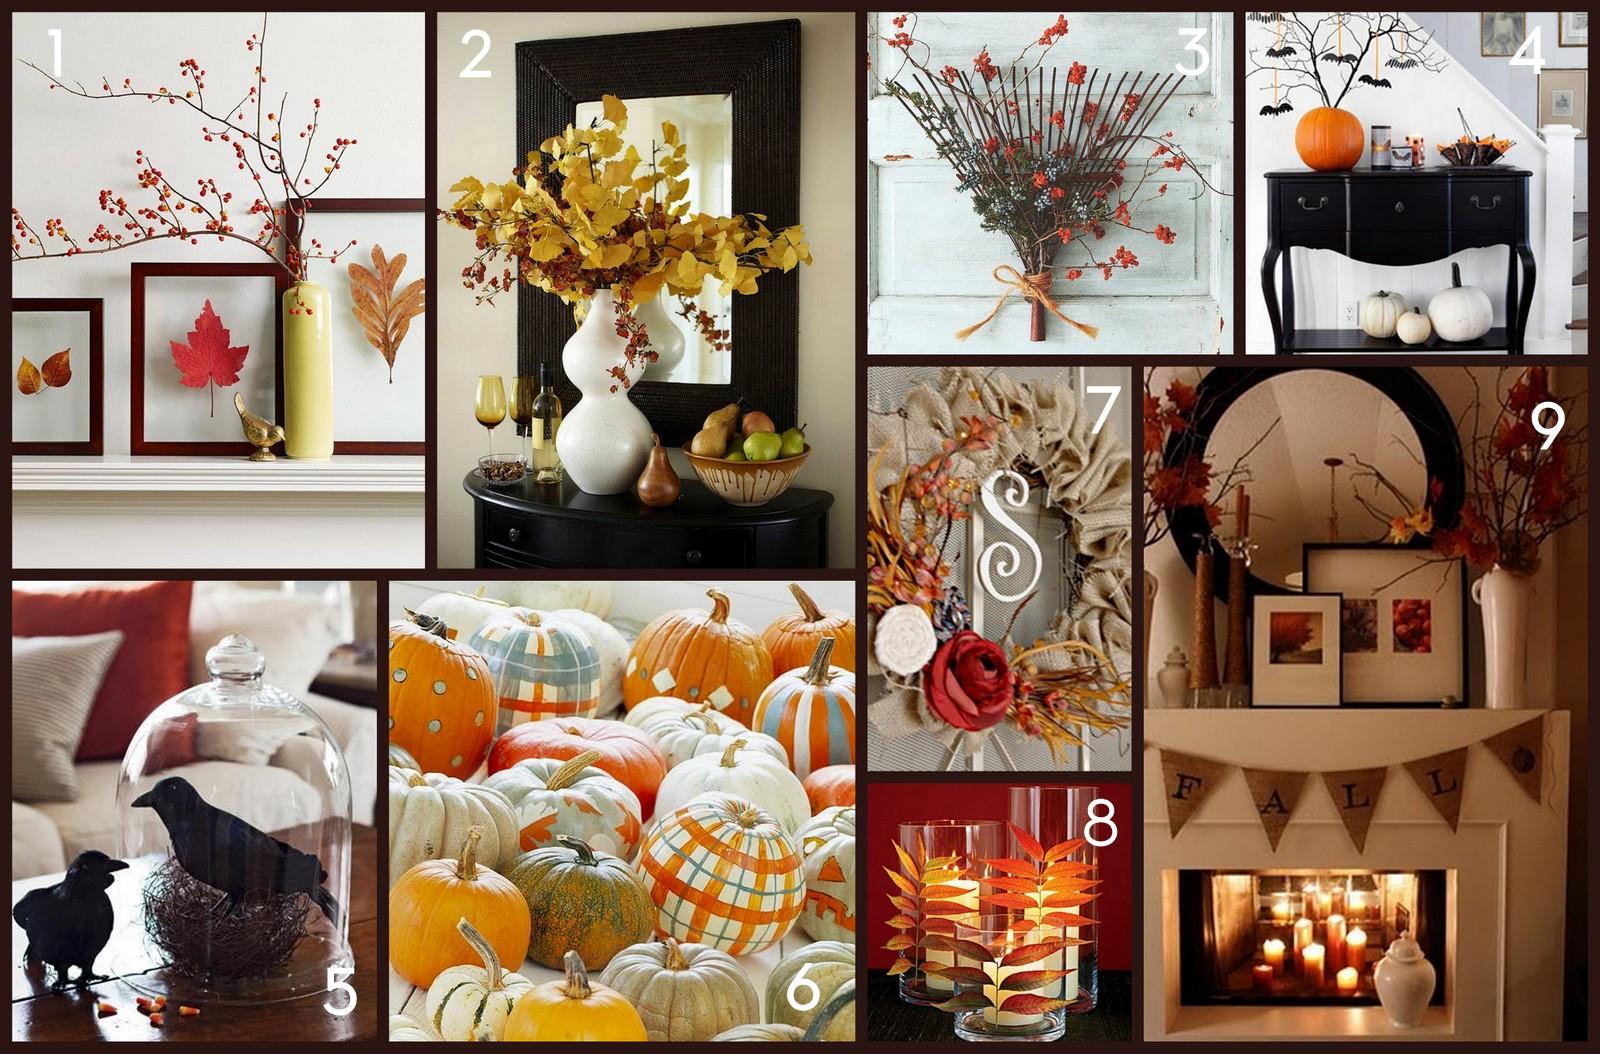 ... 109171d1e6bb62bbfdd32c60e4f81680 · Pinterest Home Decor Ideas  Incredible Bedroom Design Inspiring 20 · C0b844ff247c6b204591f7e6d48a4bea ·  Fall%2b2012 ...